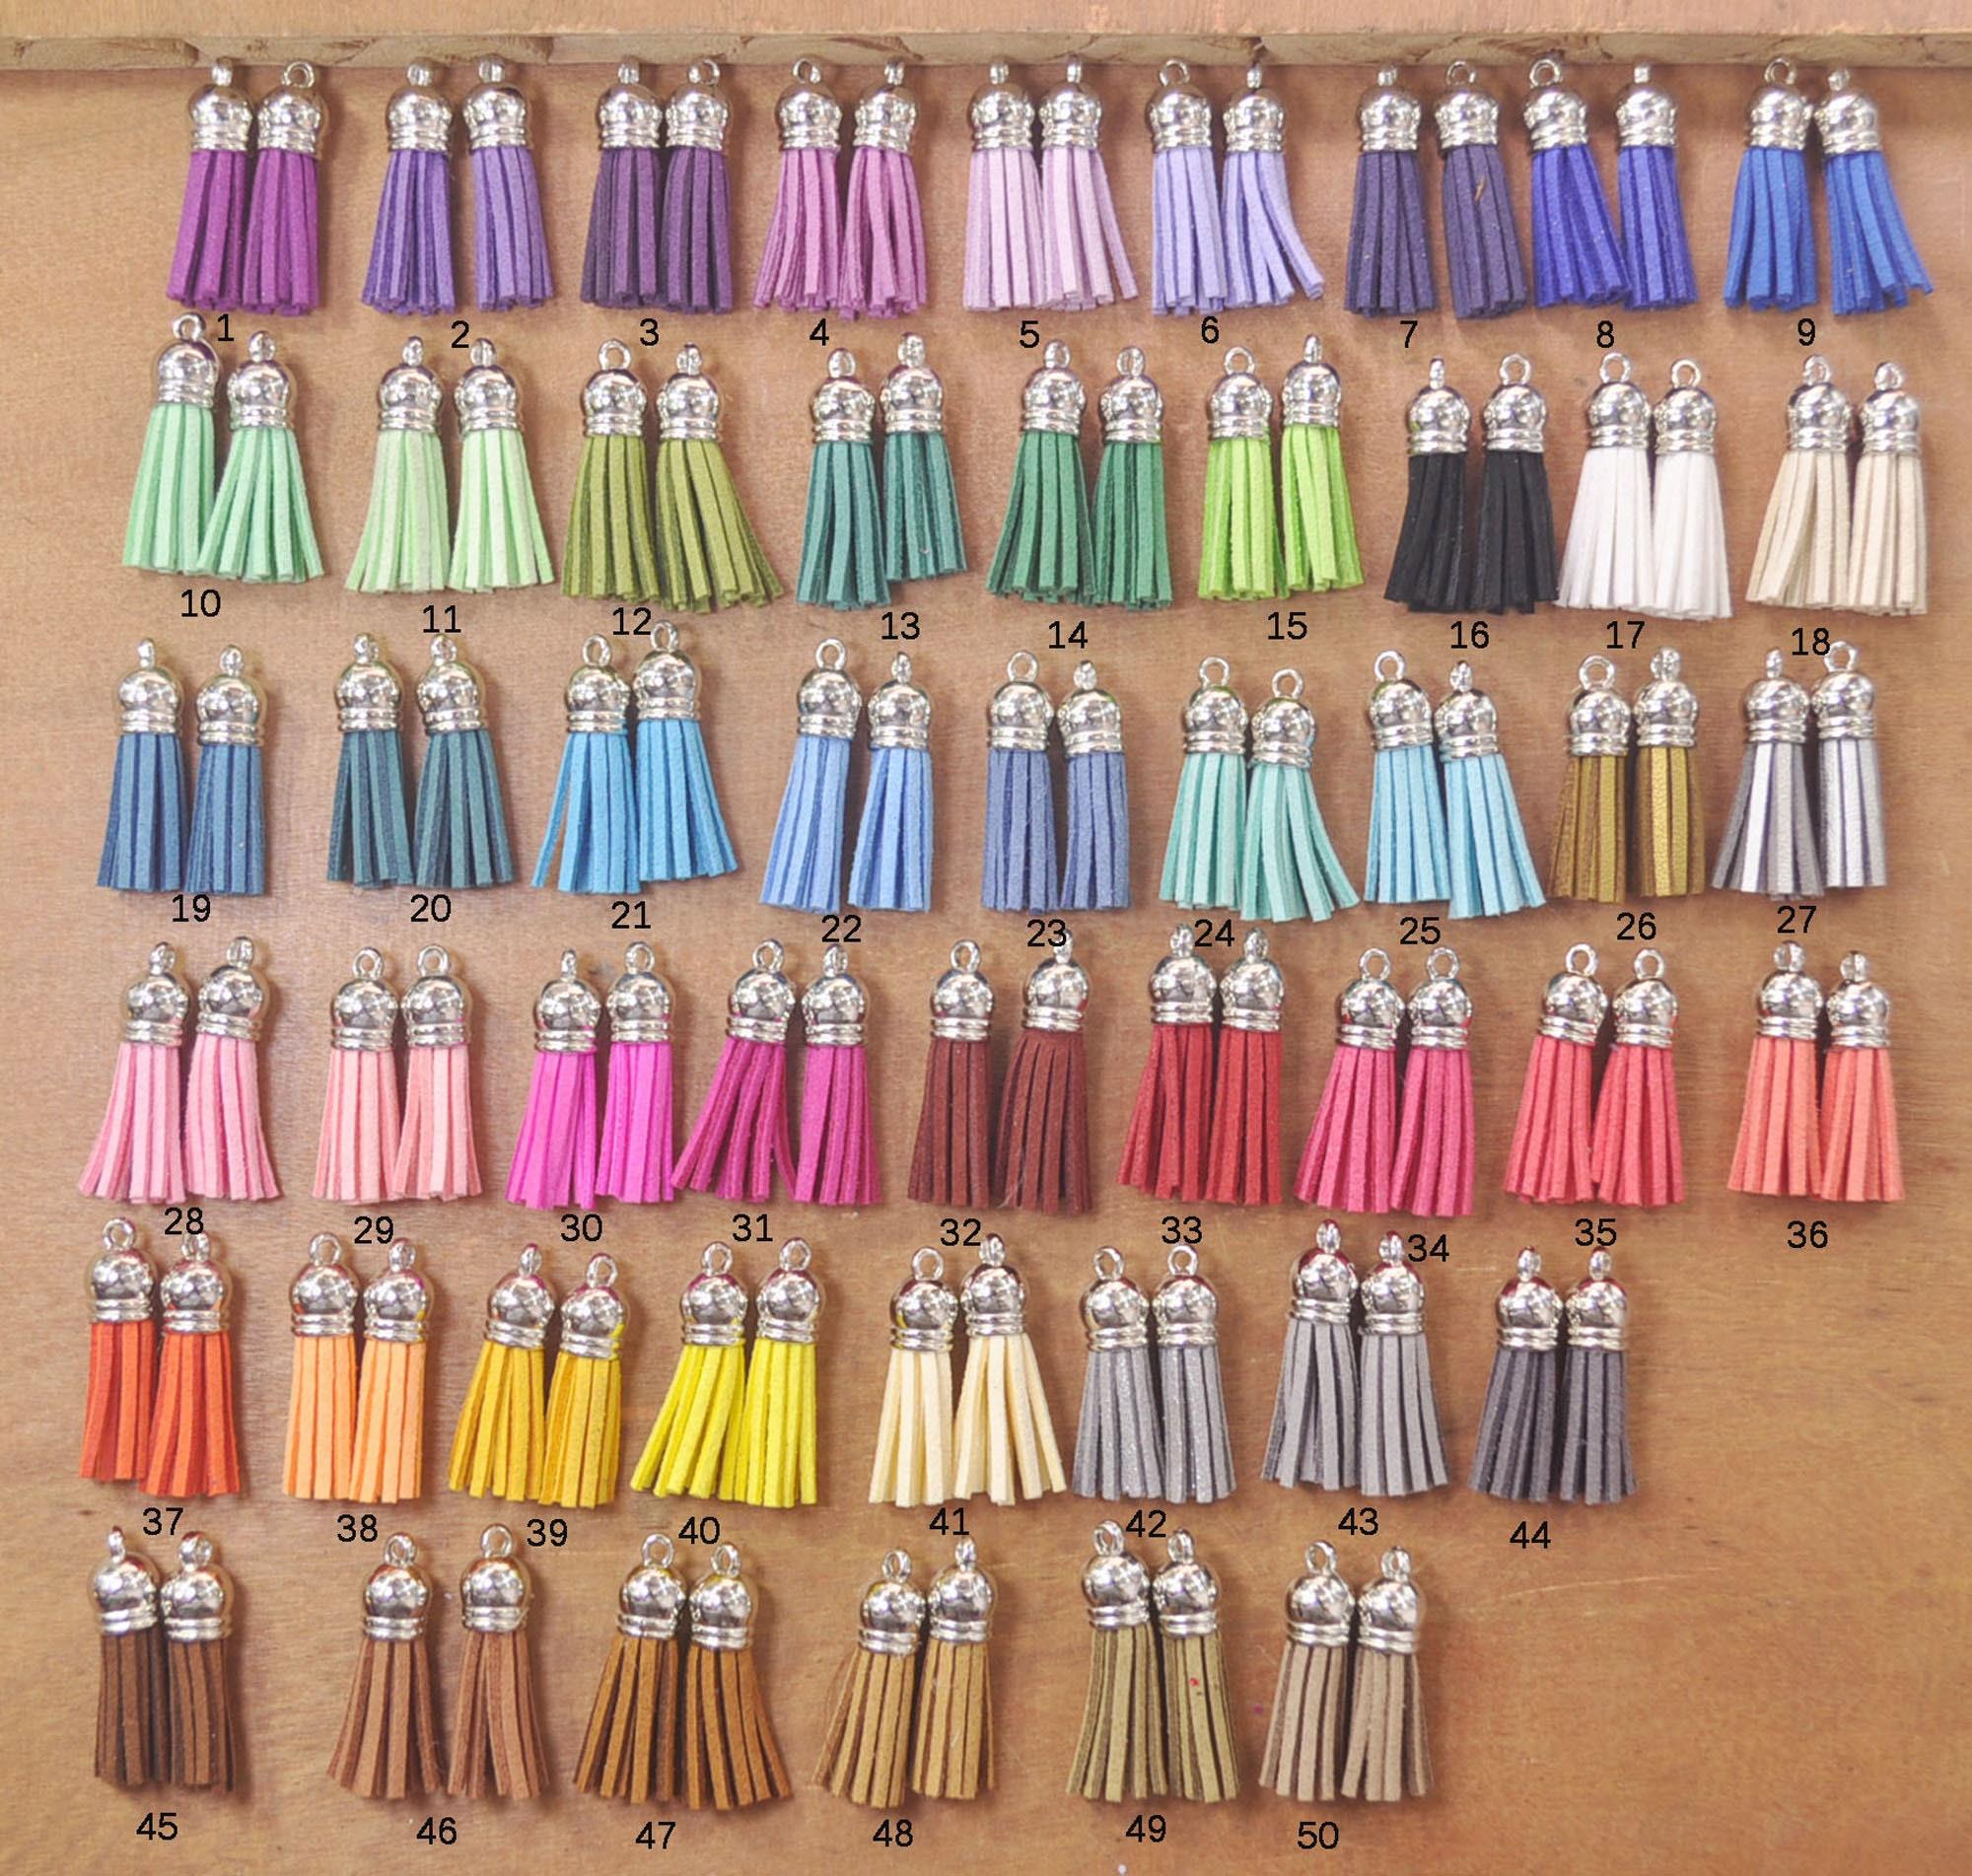 1.5/'/' Jade suede tassels 50 tassles faux leather tassels mini tassels